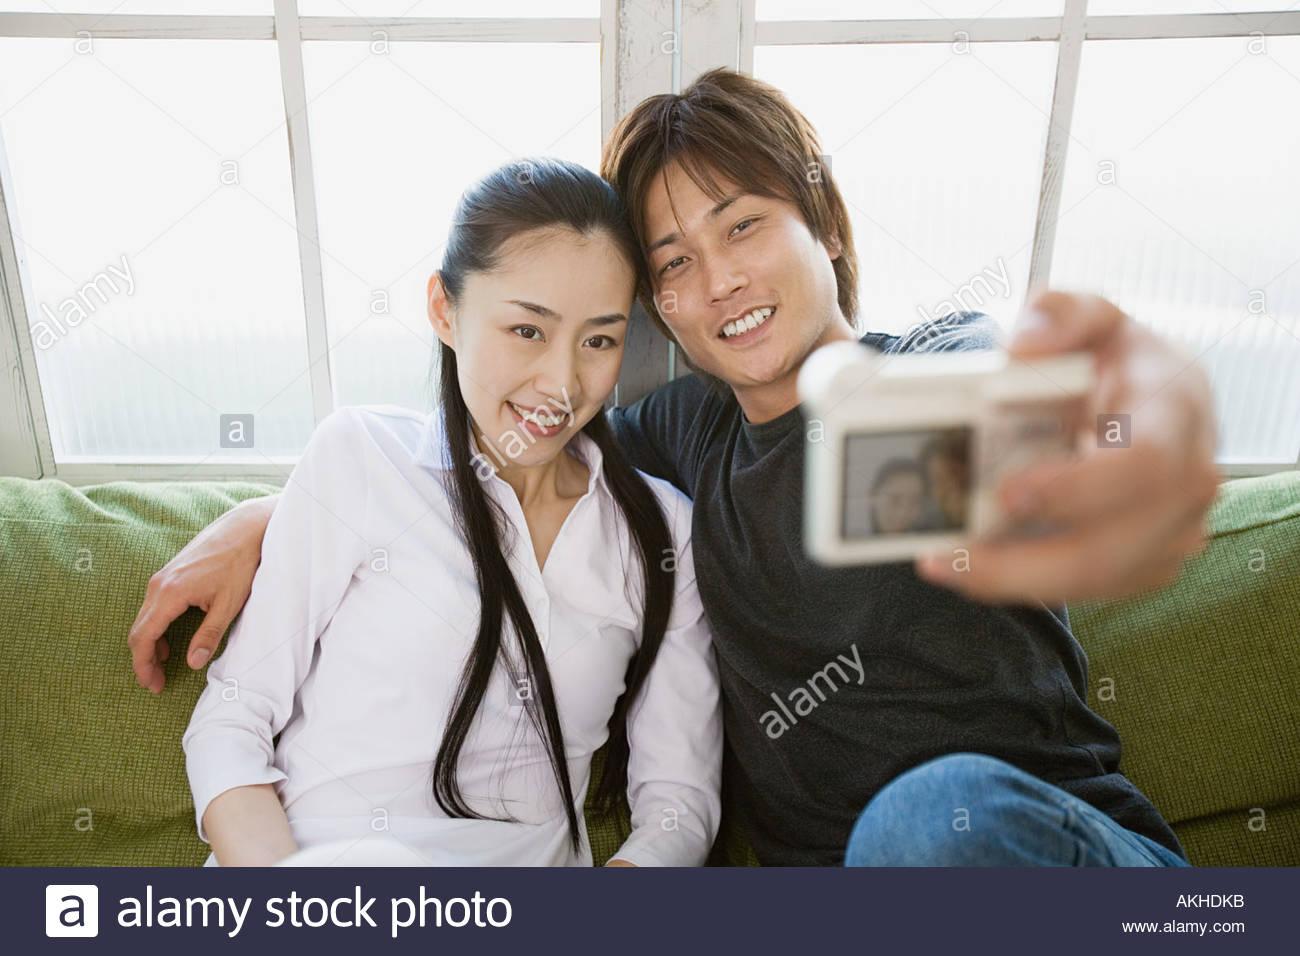 Par tomar una foto de sí mismos Imagen De Stock